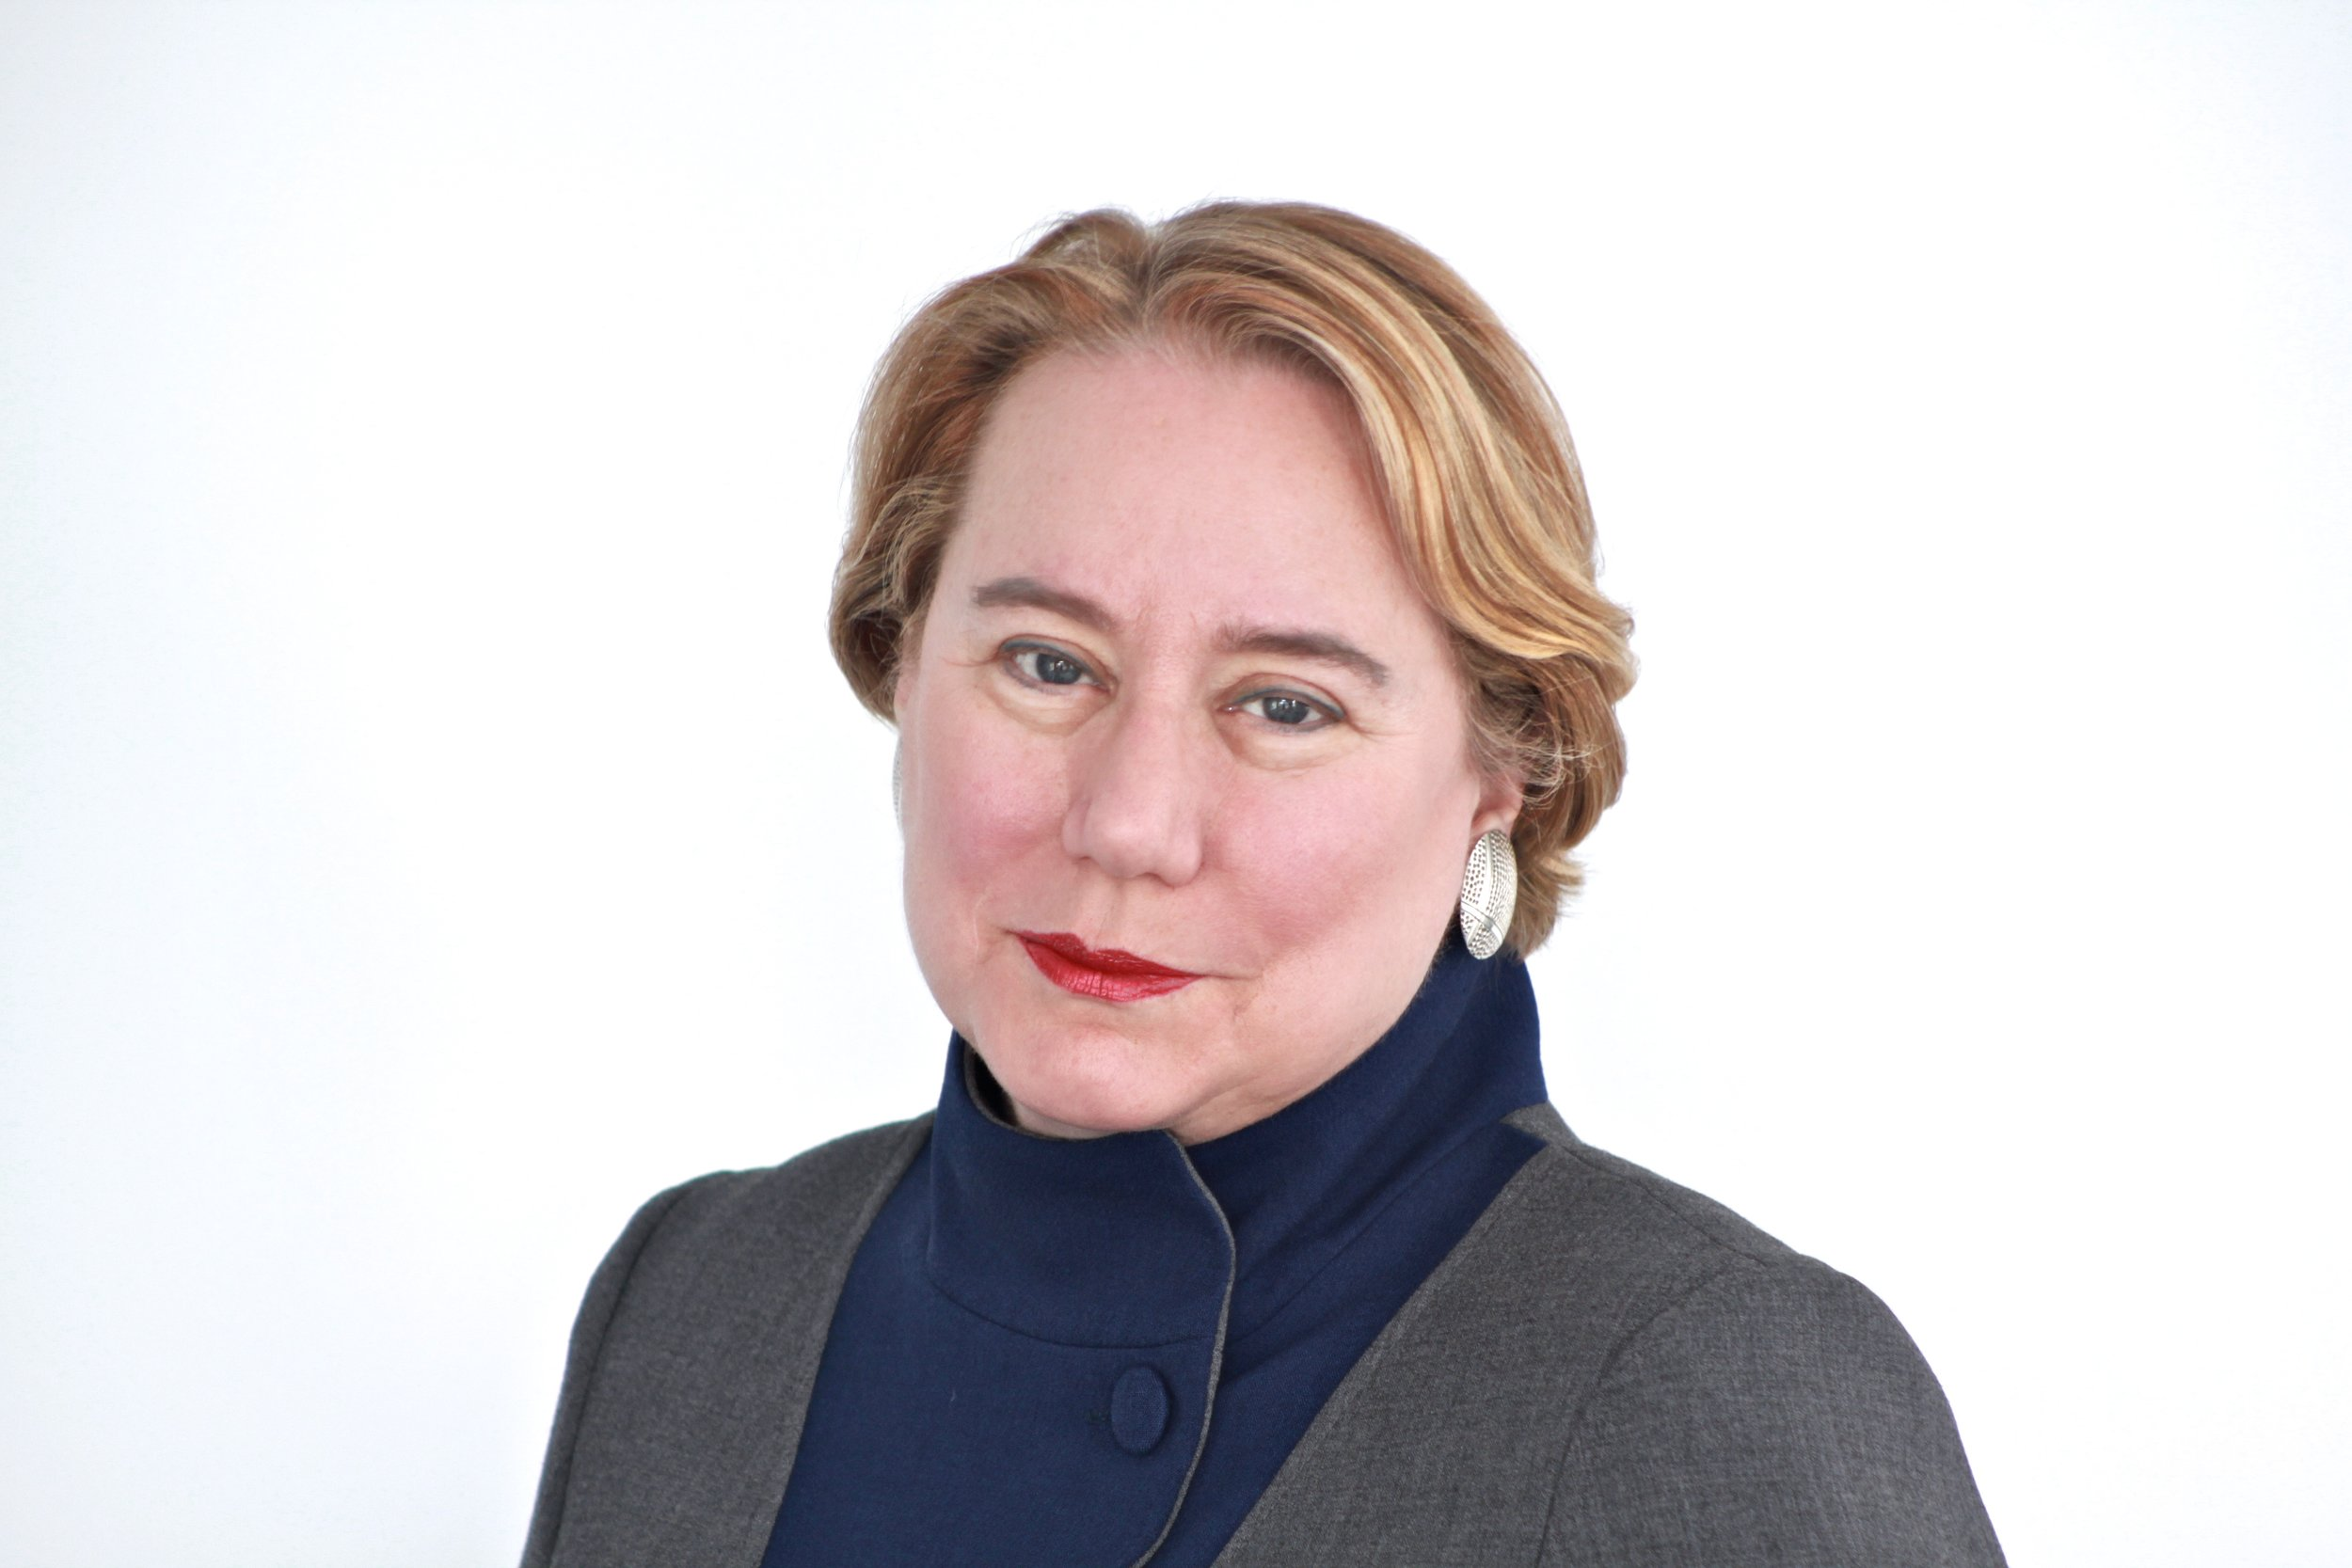 Ann Olivarius (Connecticut & Somerville 1978)